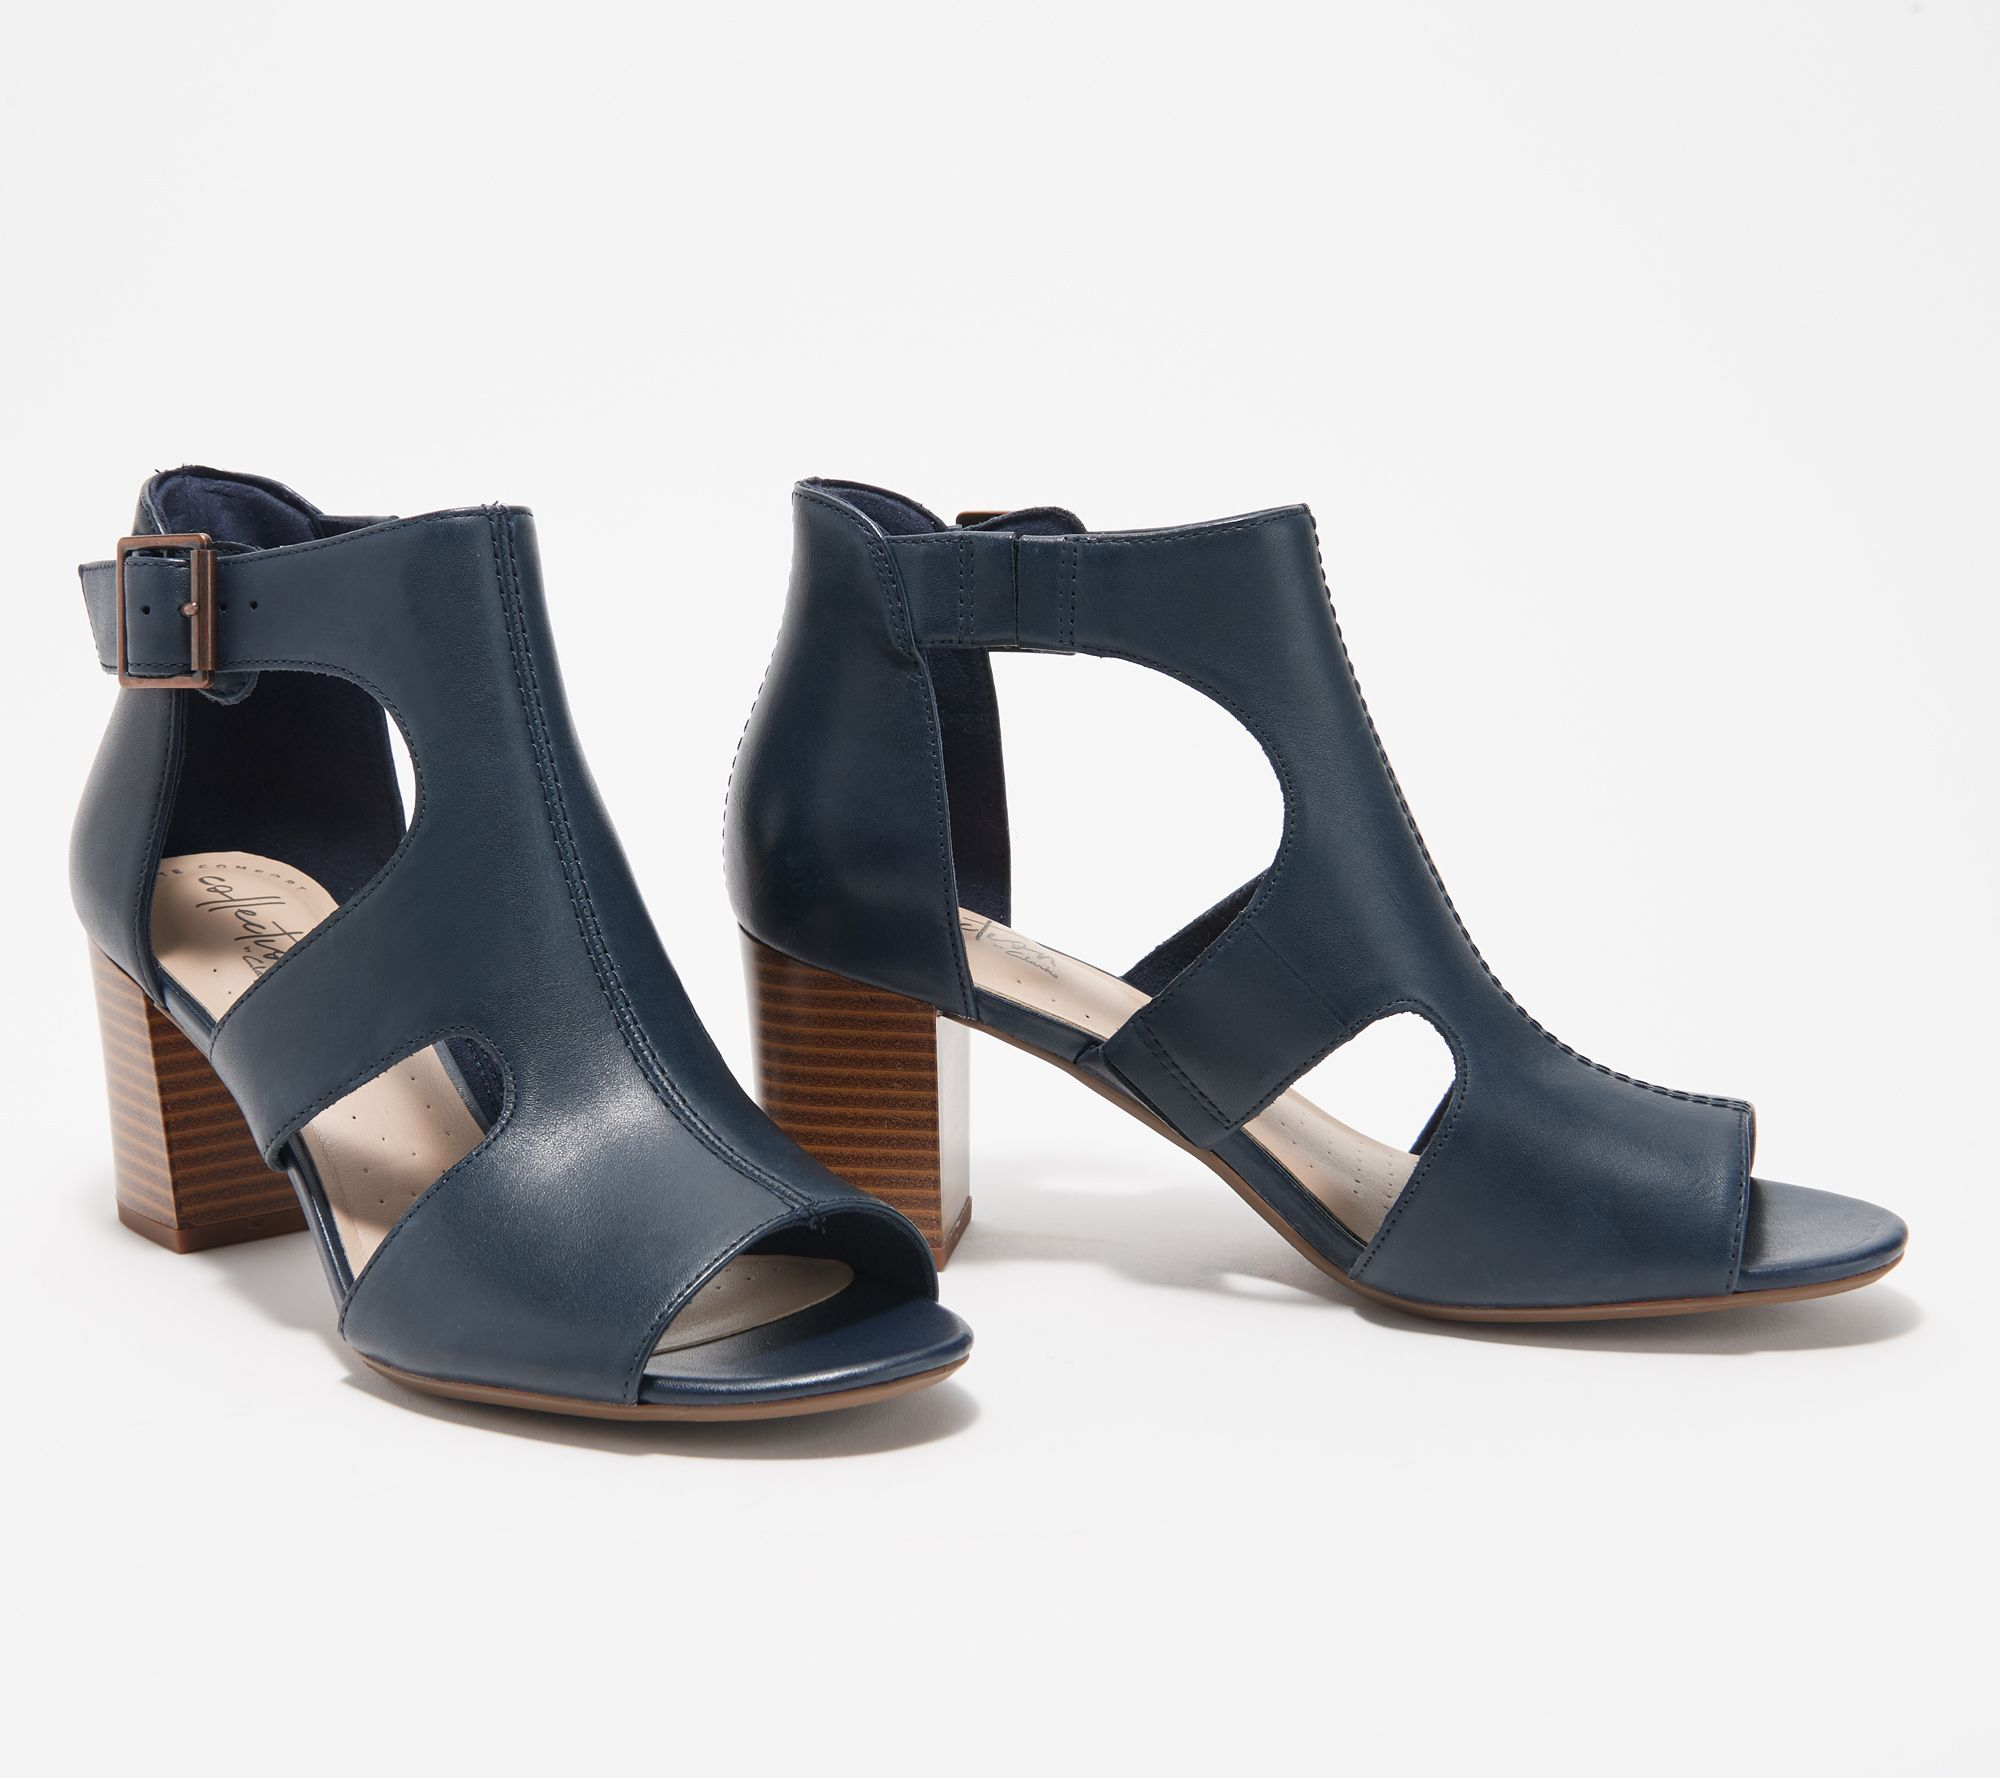 ac0c4dd4e9d Clarks Collection Leather Heeled Sandals - Deva Heidi — QVC.com